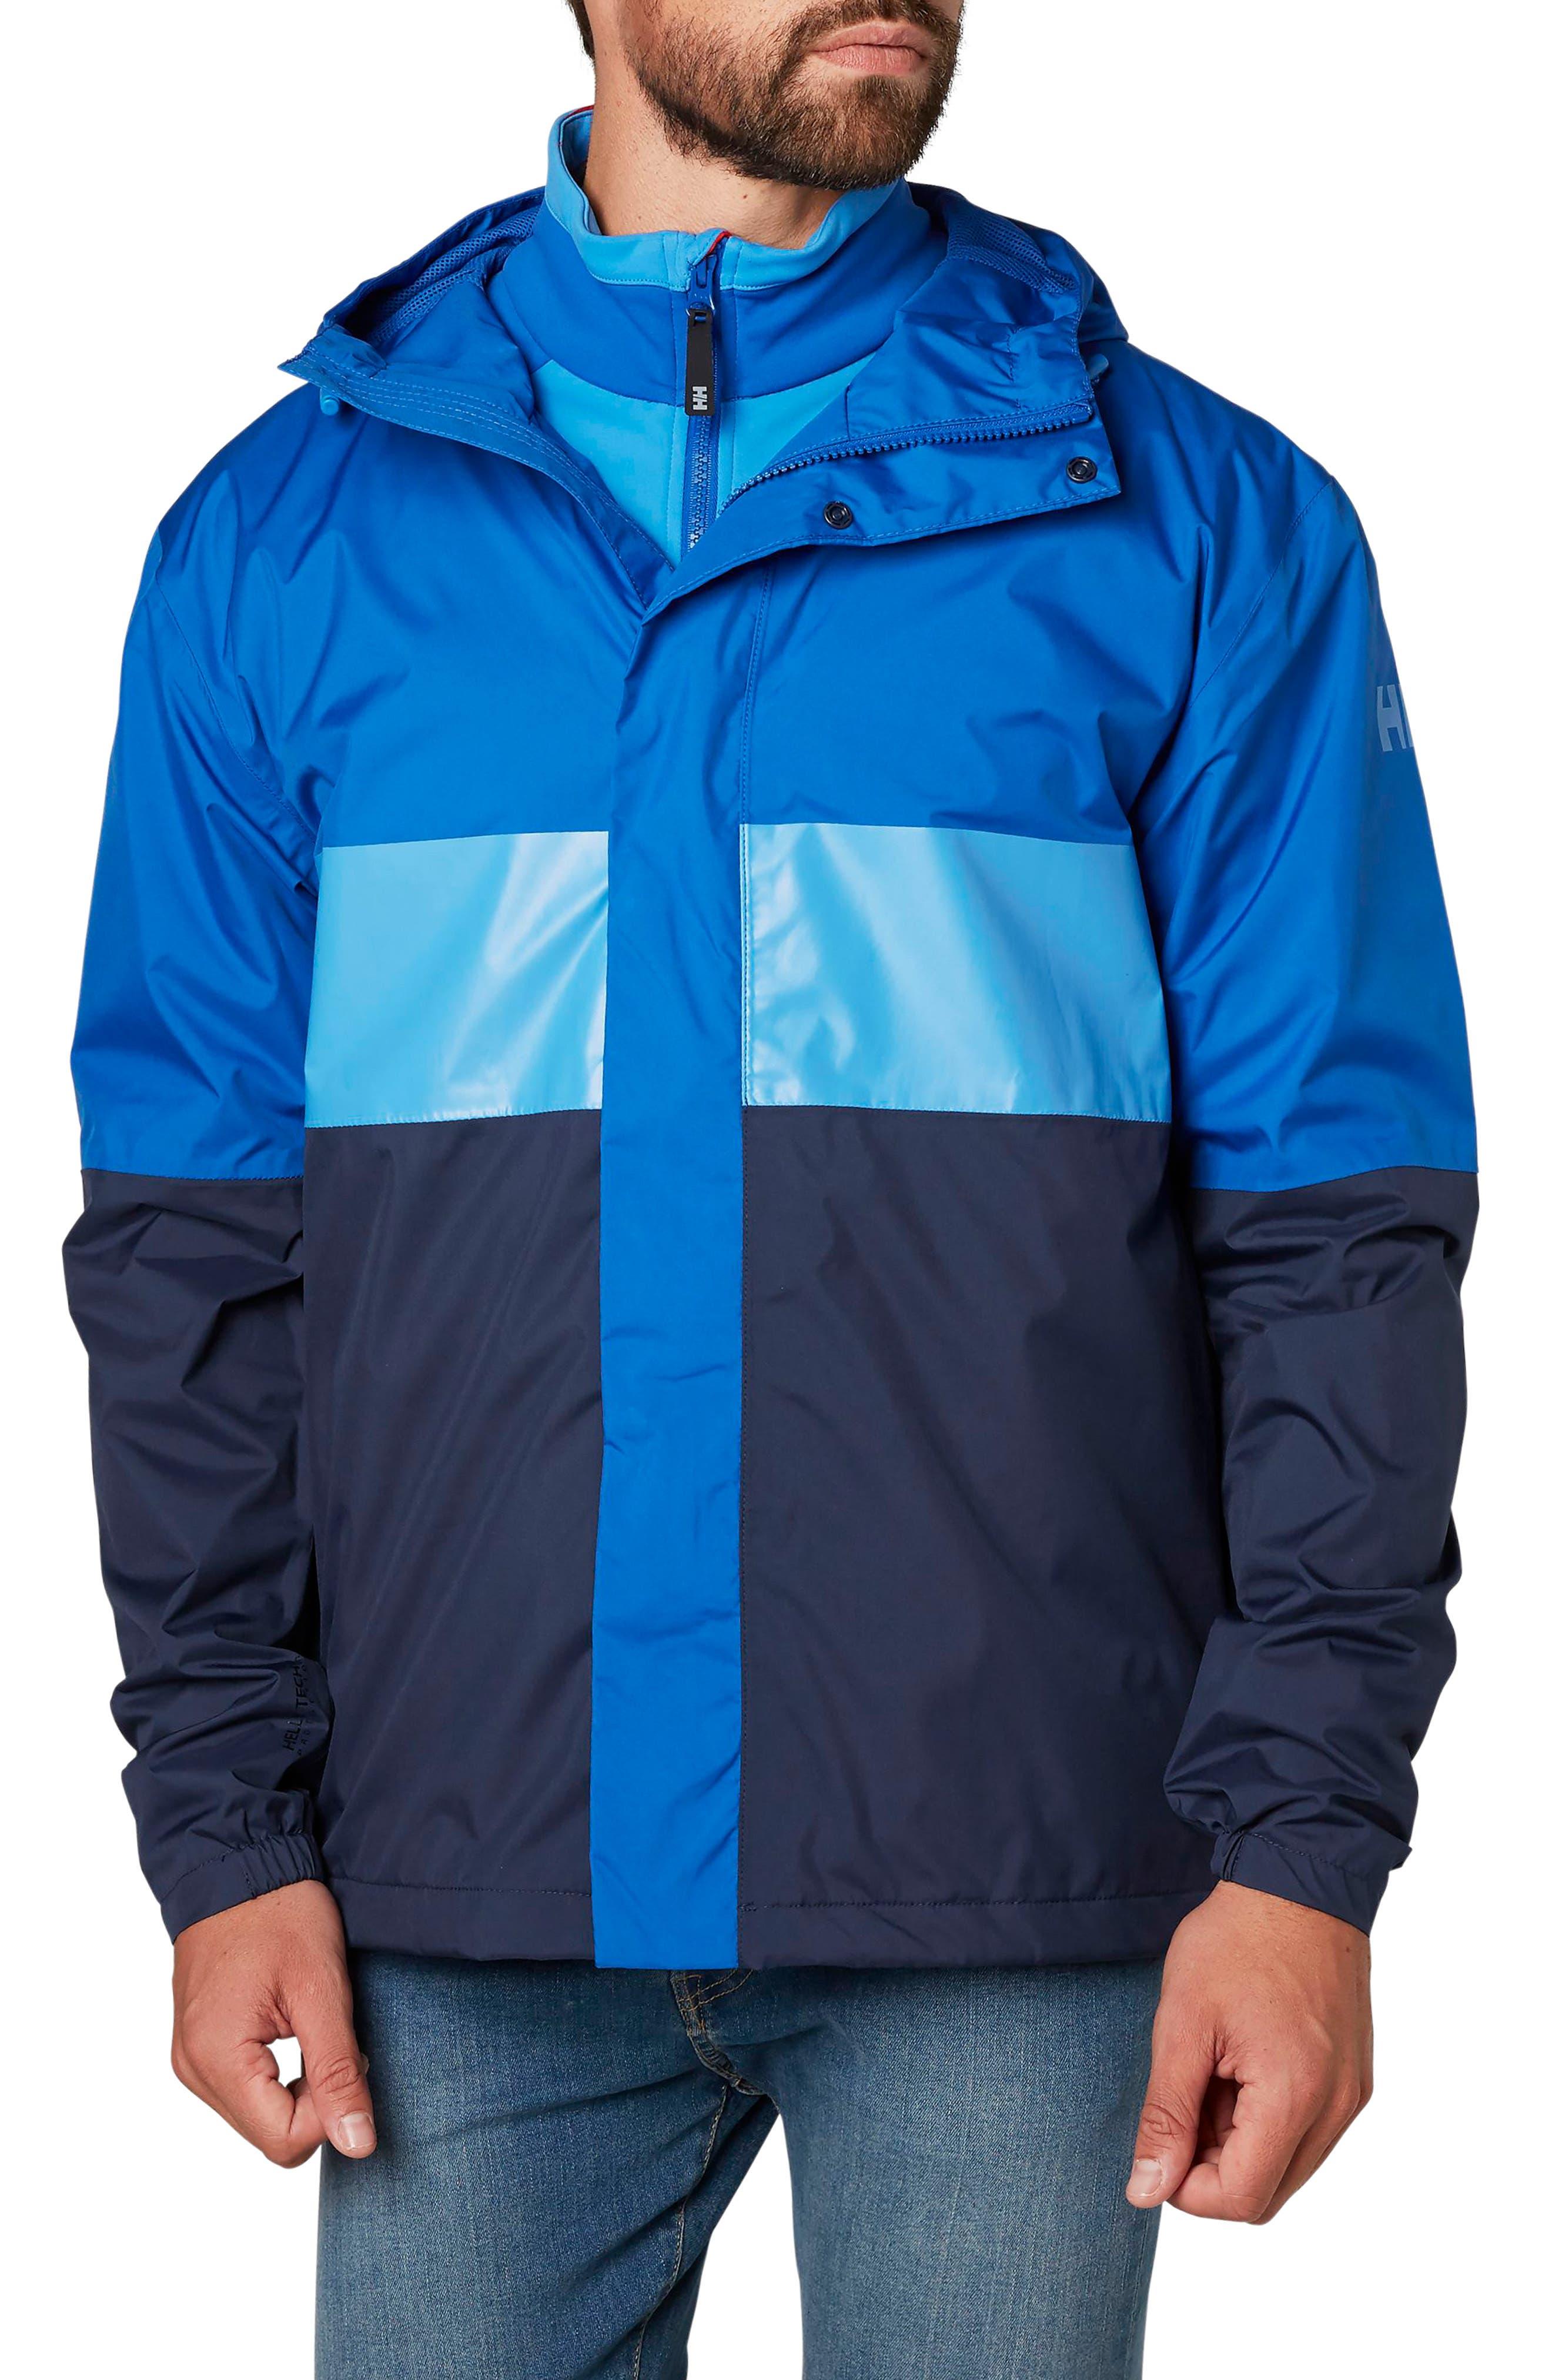 Main Image - Helly Hansen Active Jacket